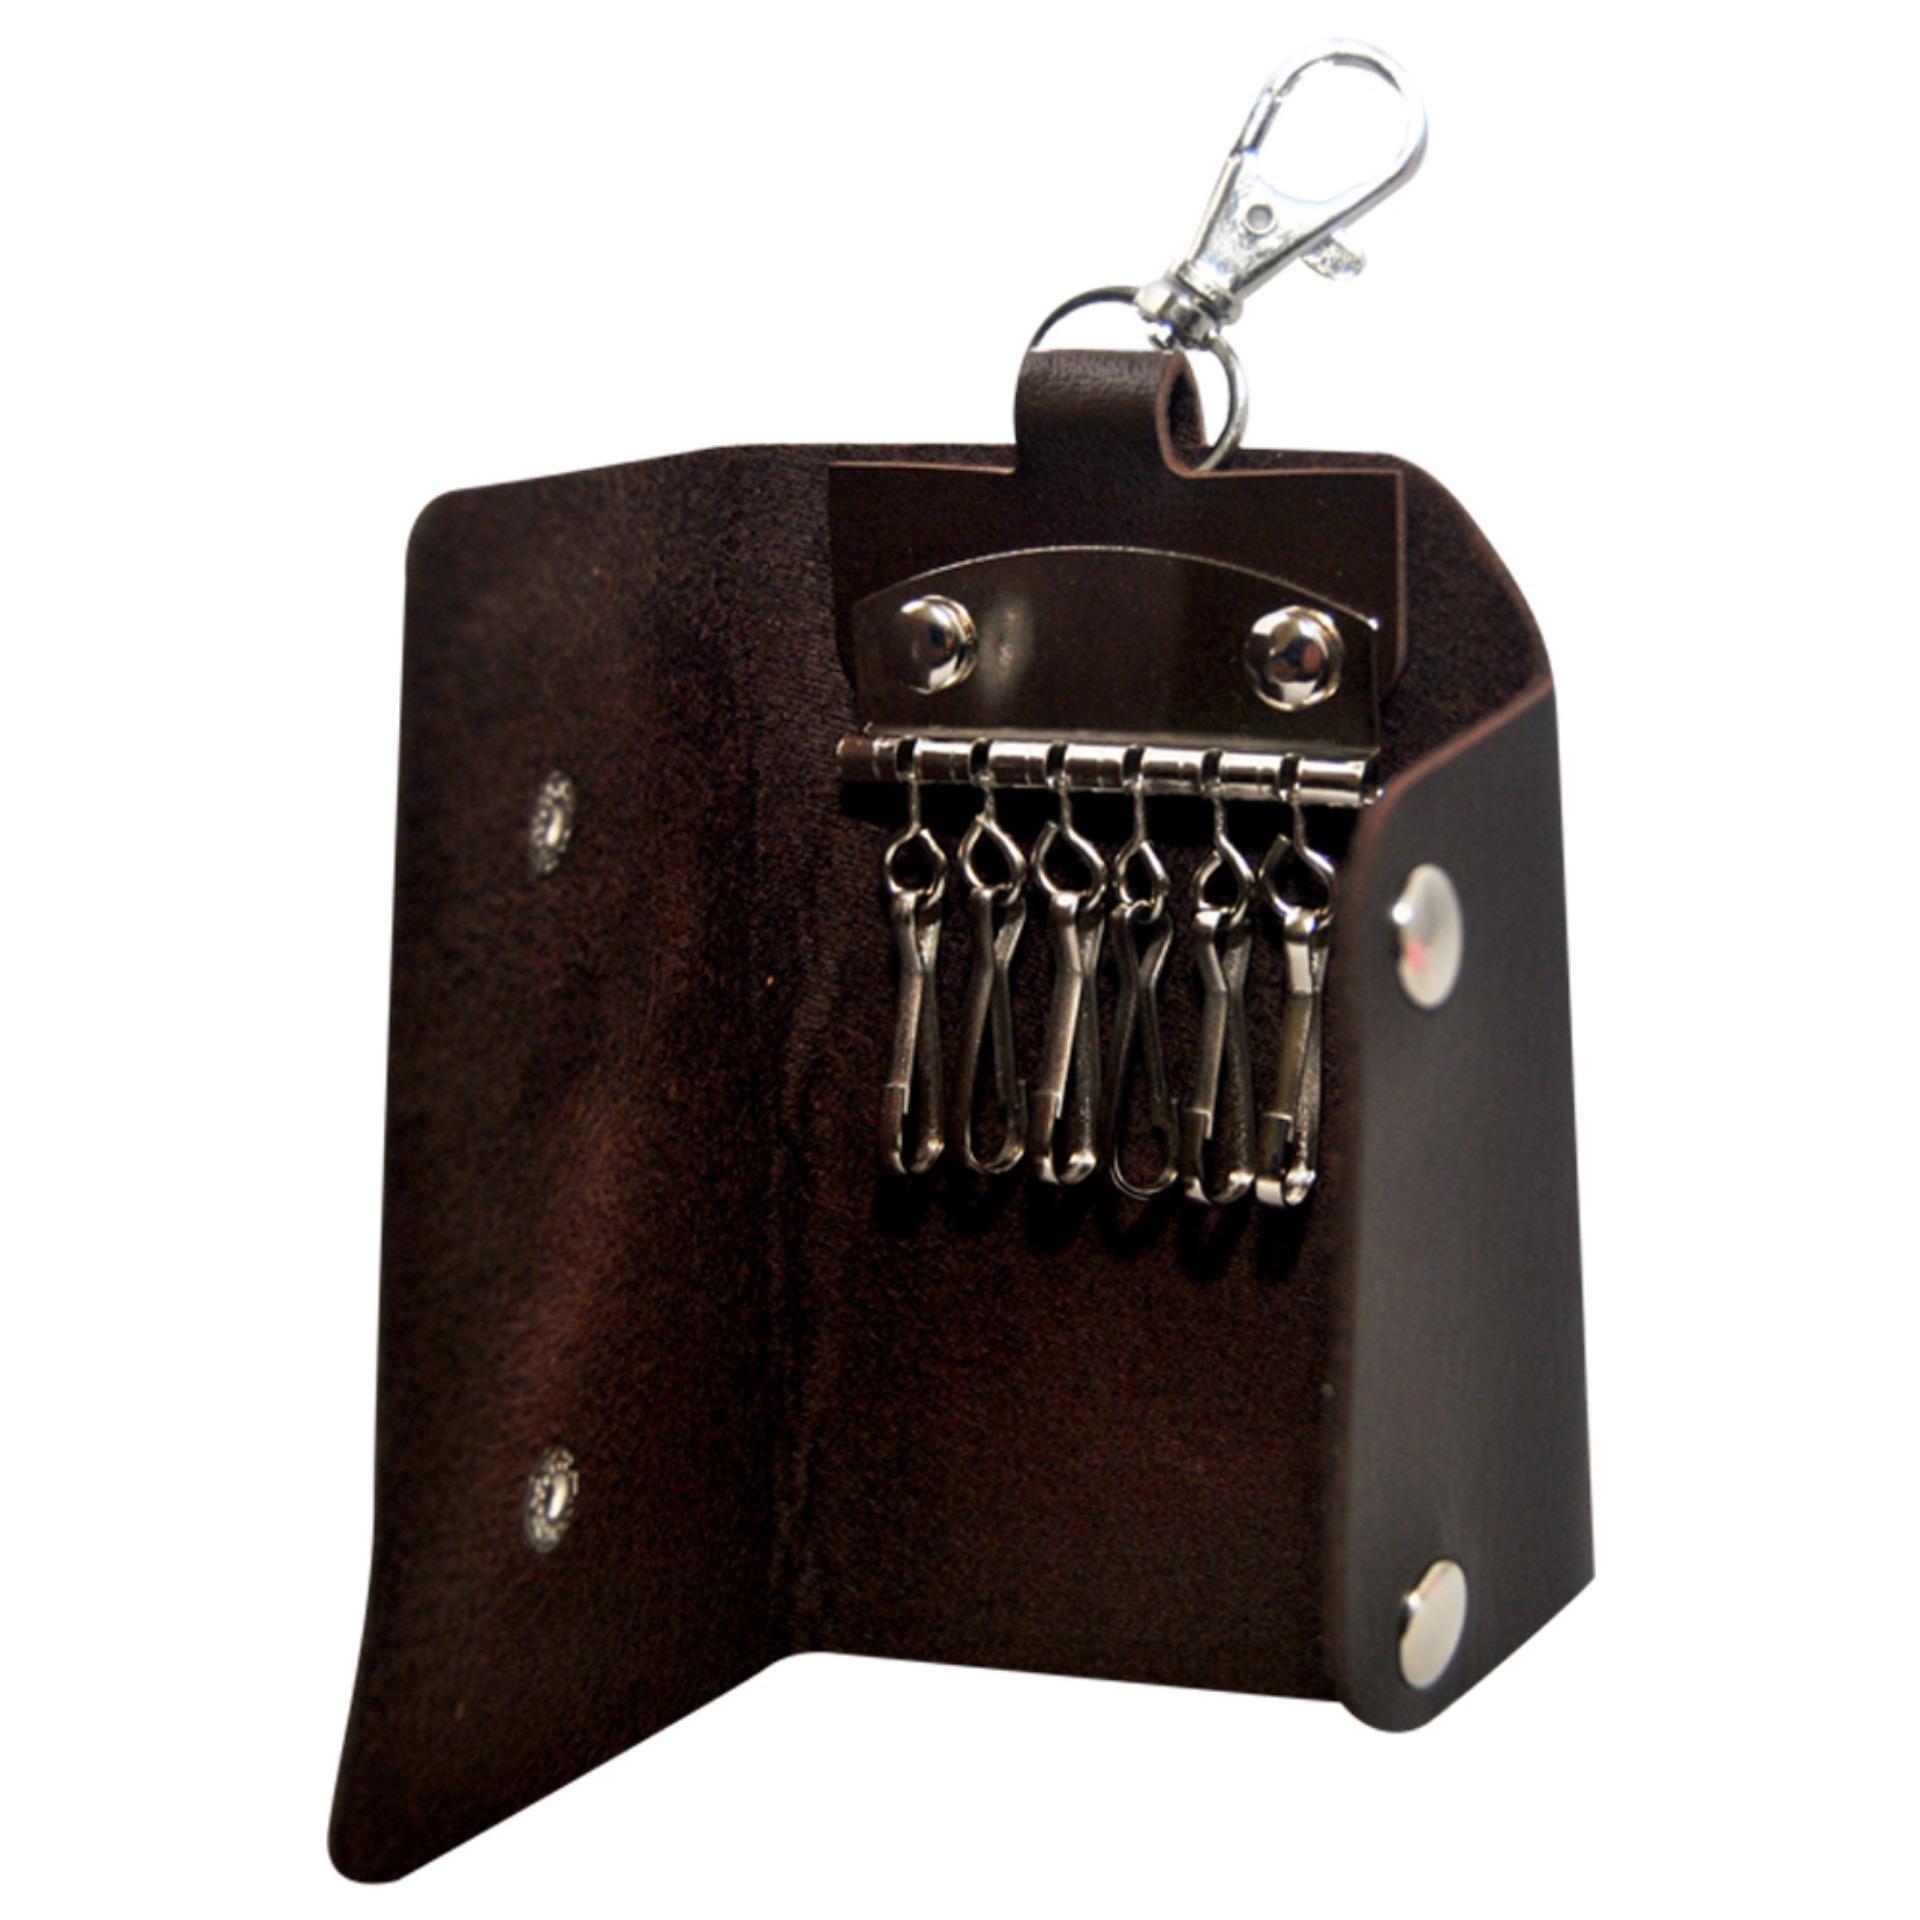 Autorace Dompet / Gantungan Kunci Mobil Motor Polos - Brown